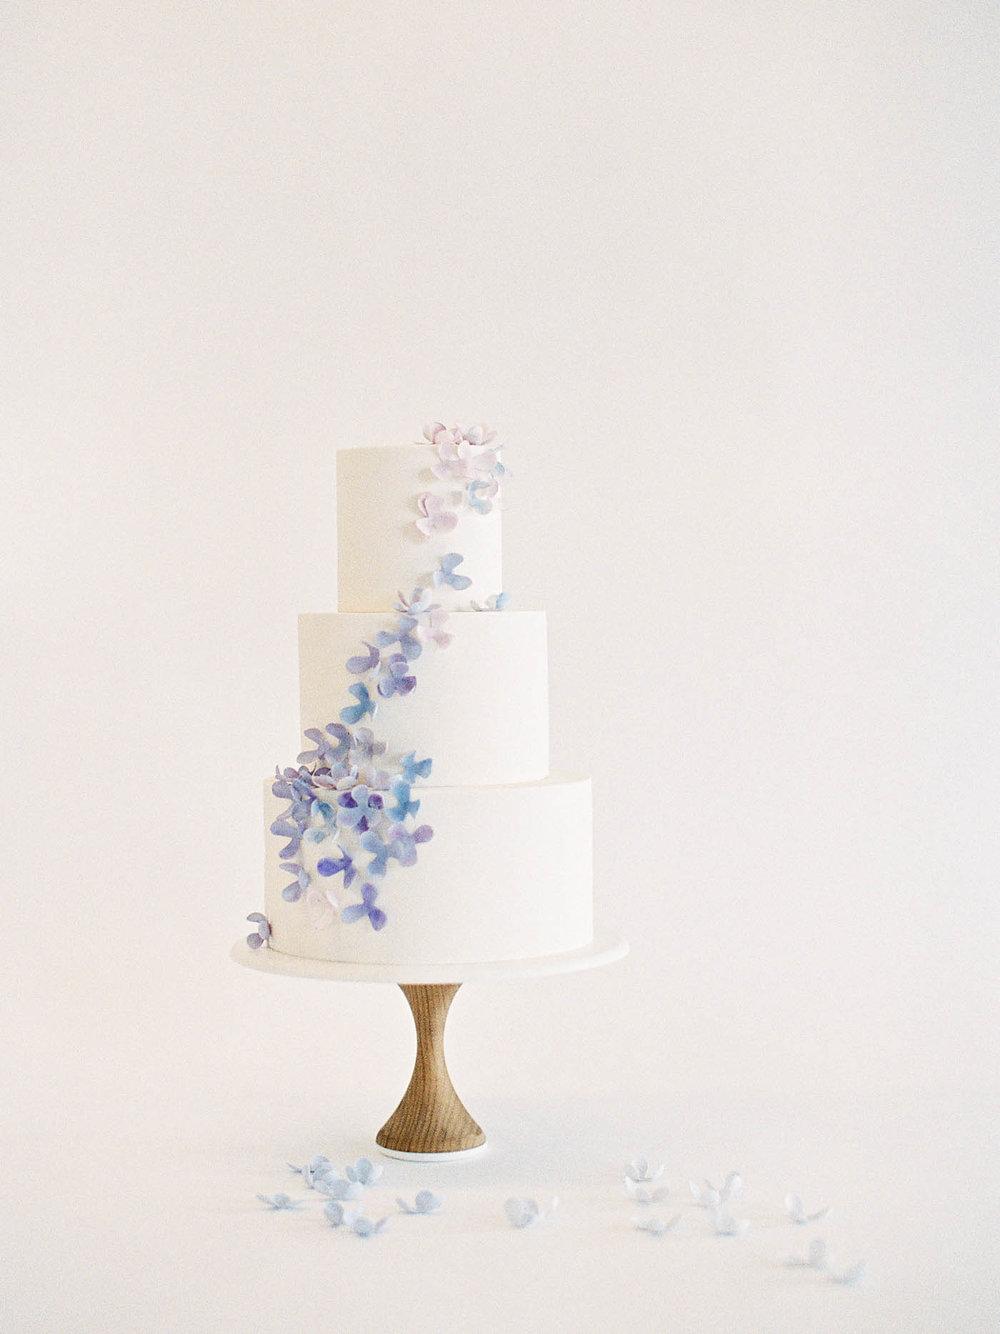 Delicate-Wedding-Cakes-19-Jen_Huang-002343-R1-001.jpg